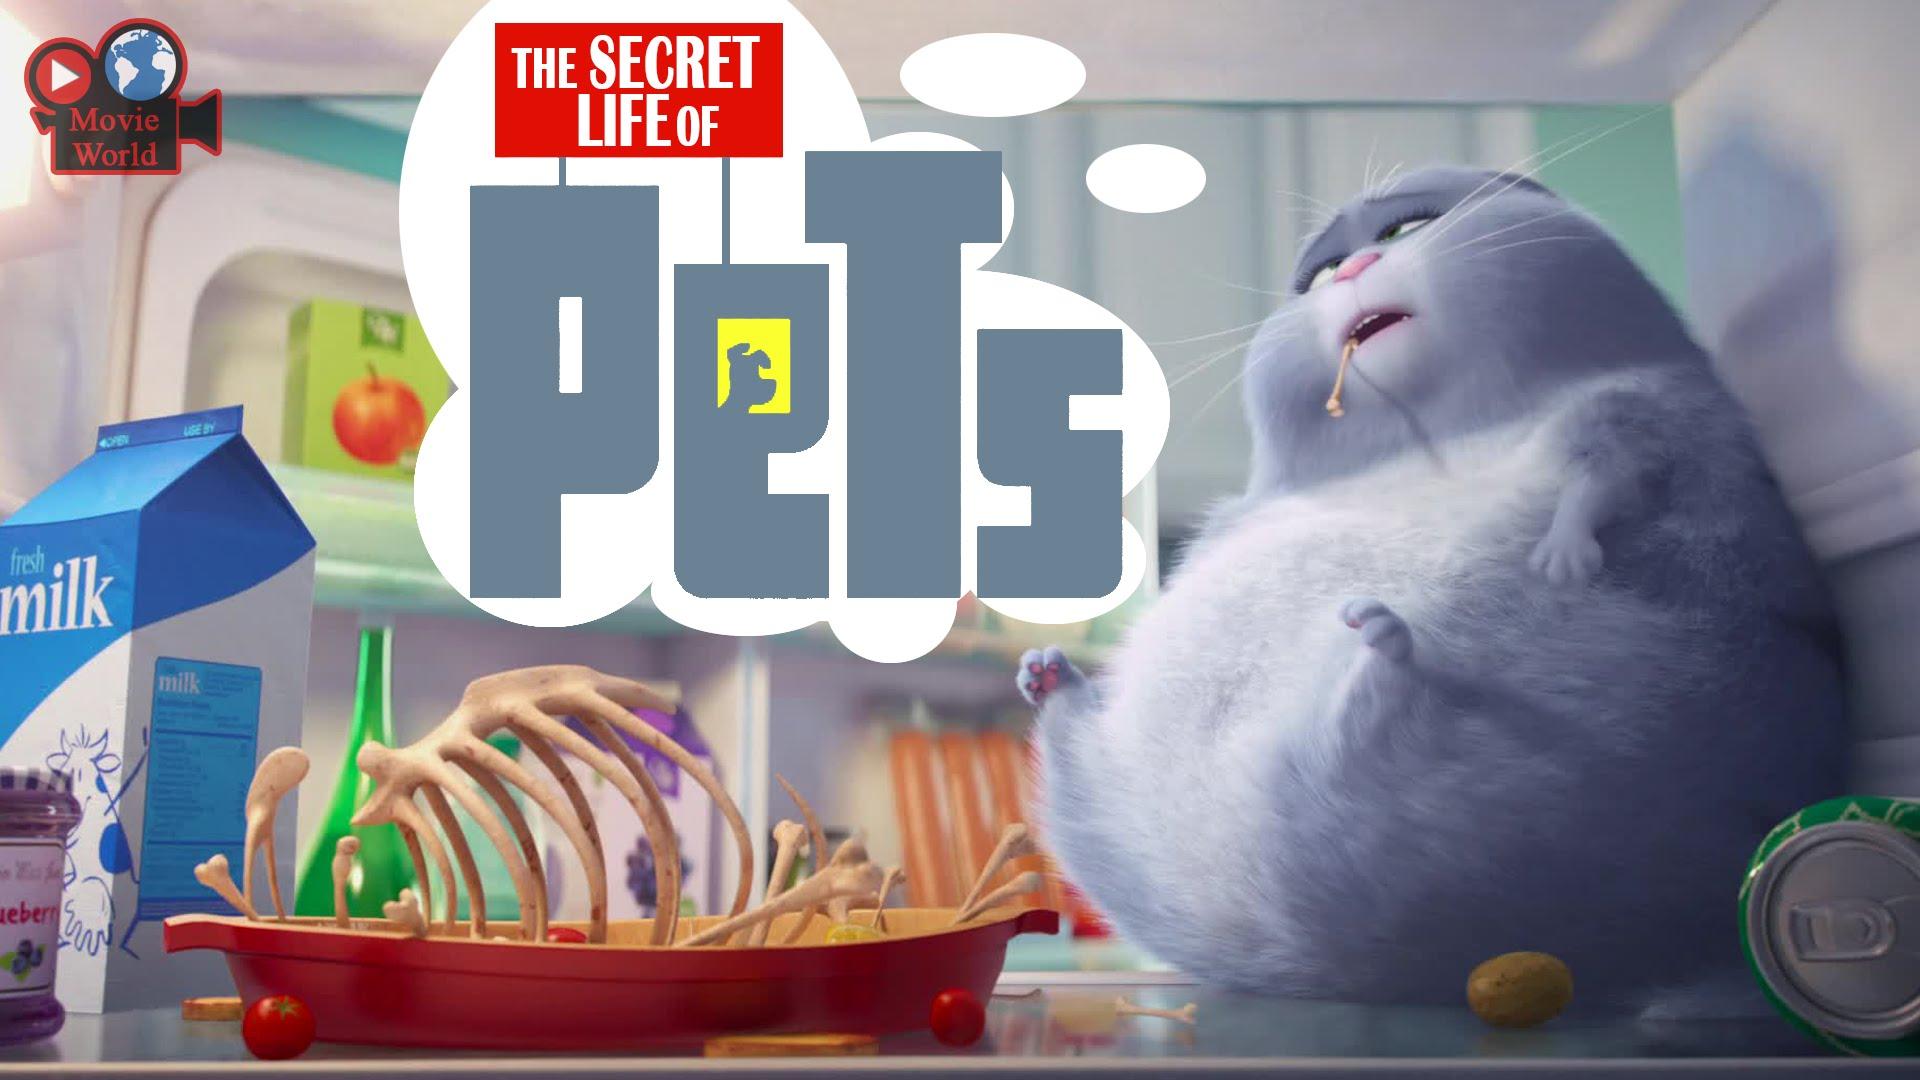 The Secret Life Of Pets Wallpaper Movie Trailers Wallpaper